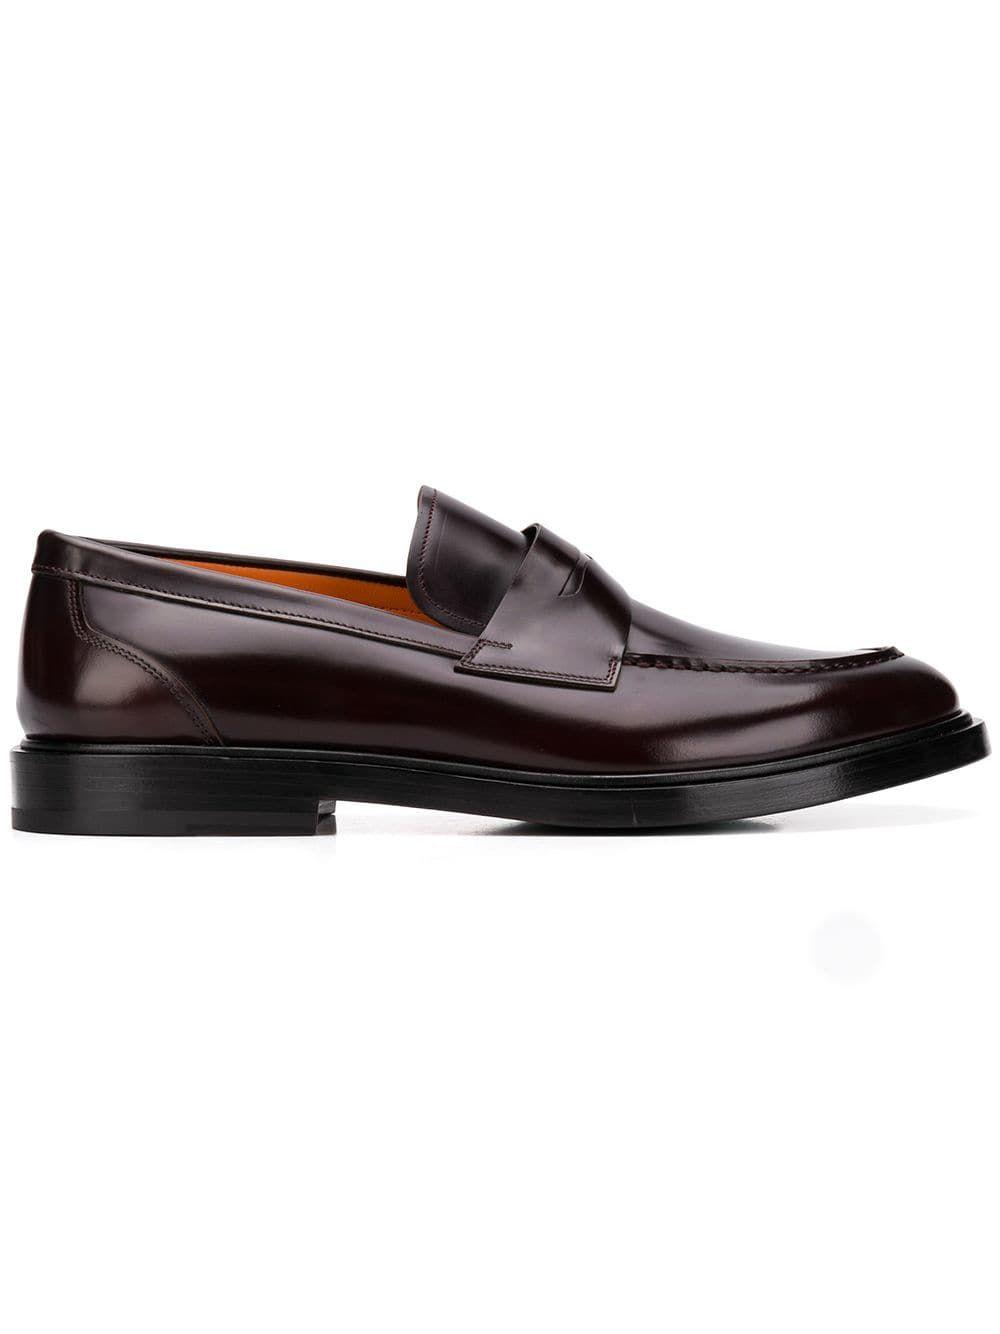 ec05c1943d7 SANTONI SANTONI CLASSIC PENNY LOAFERS - BROWN.  santoni  shoes ...